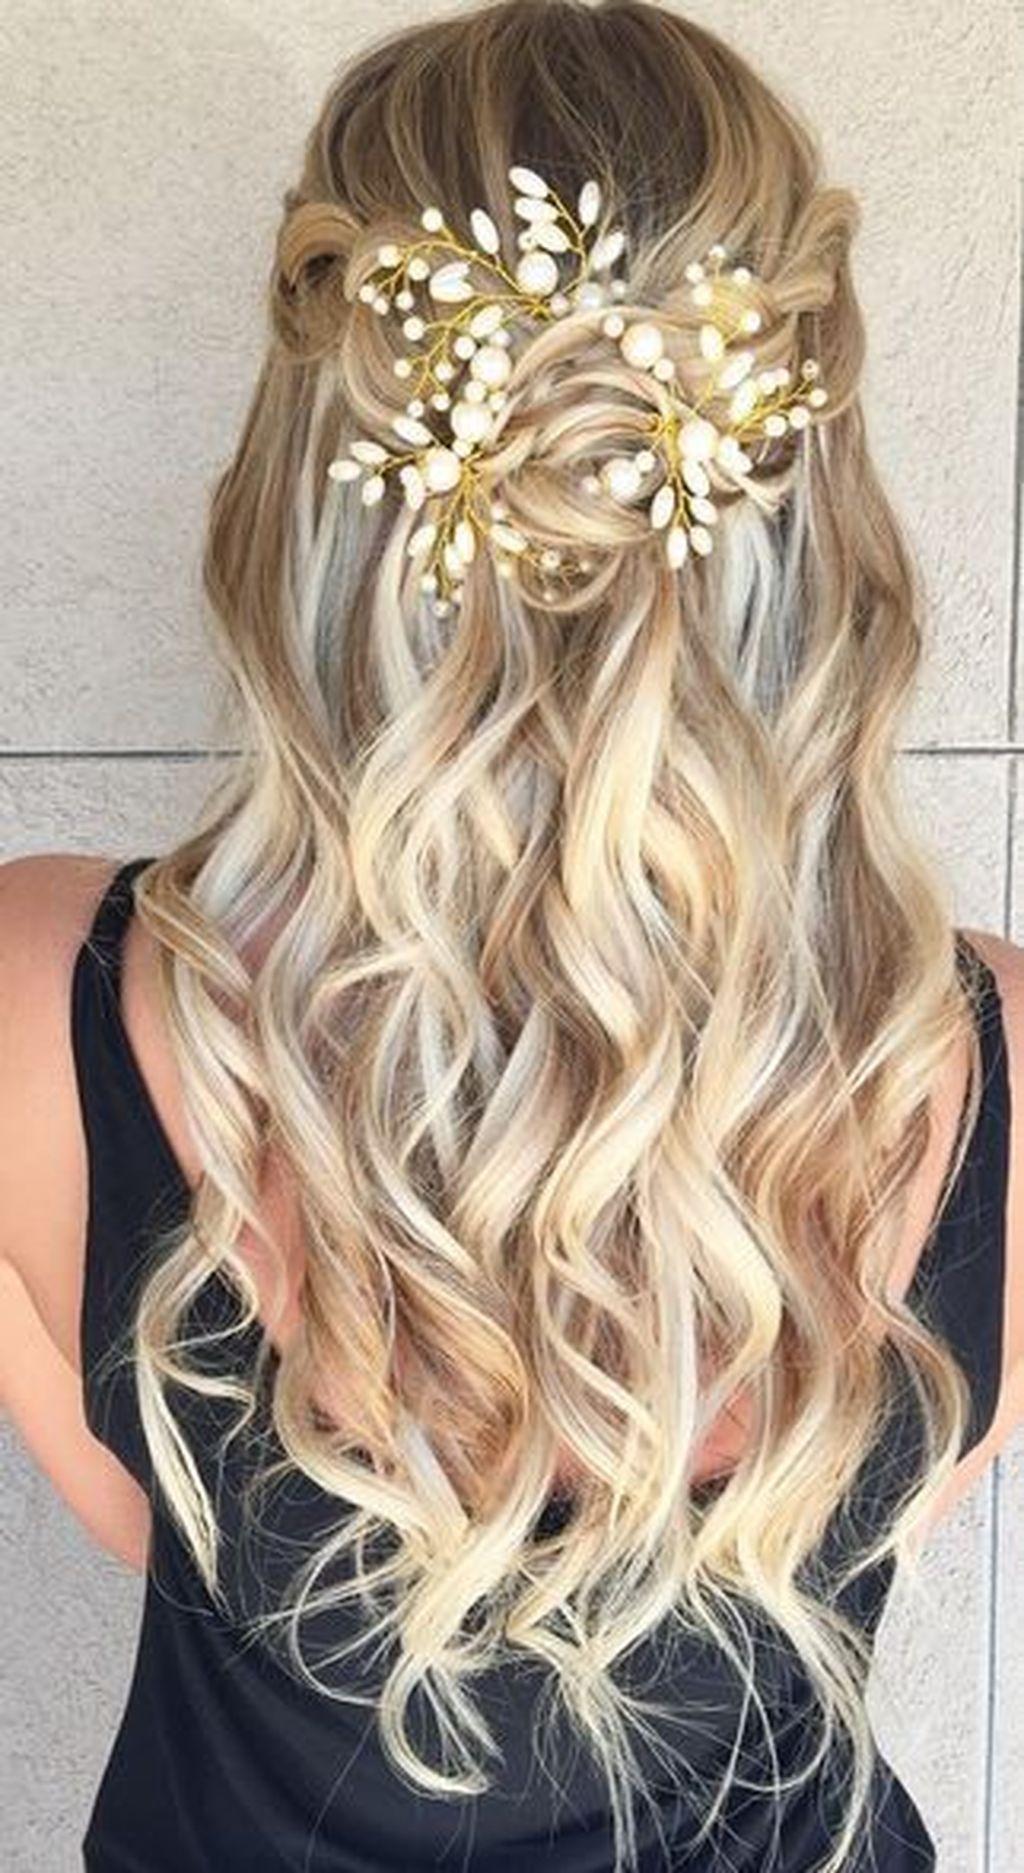 36 Amazing Half Up Half Down Wedding Hairstyles Ideas